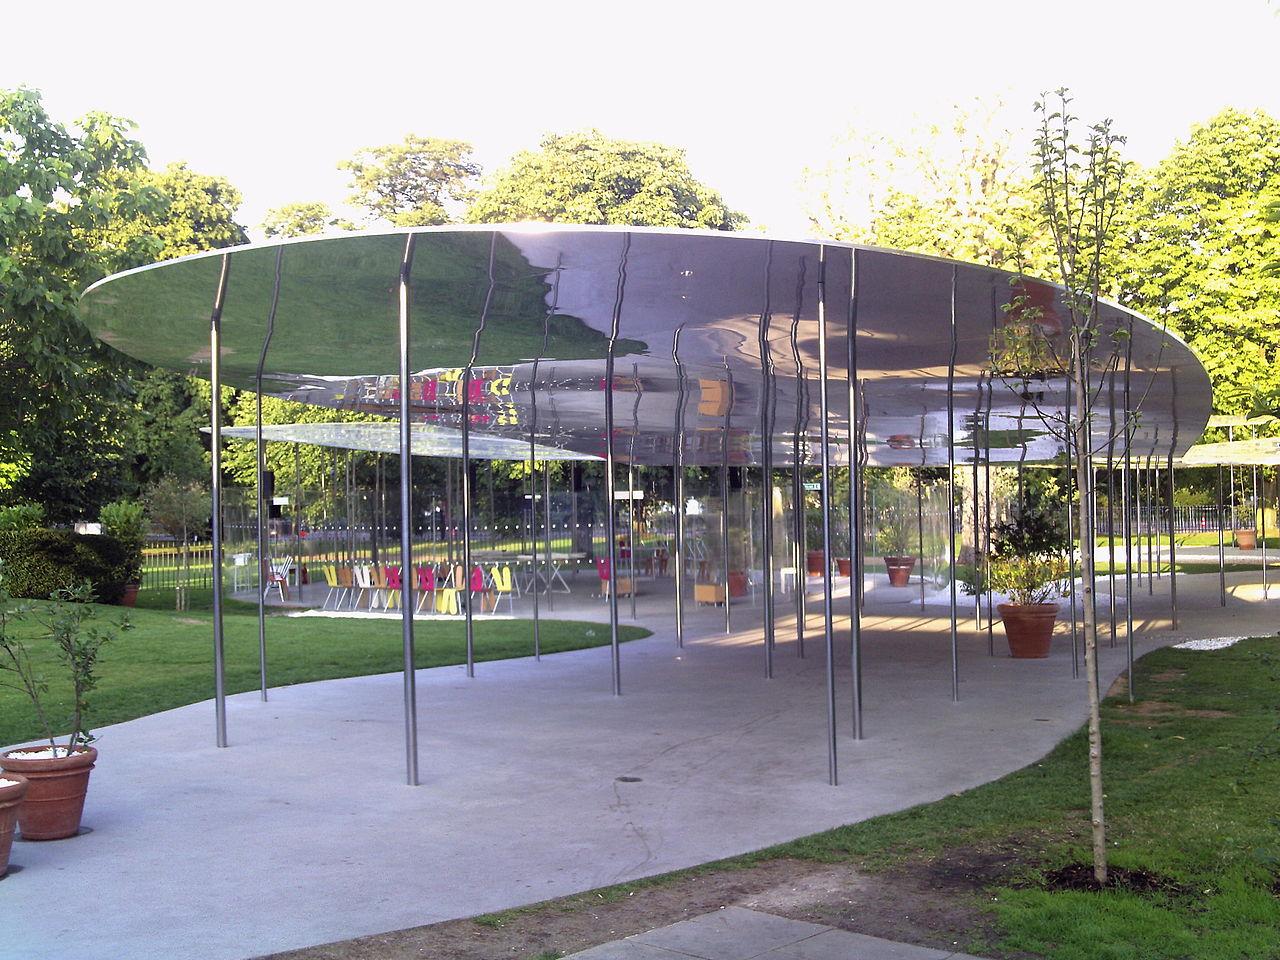 File Serpentine Gallery Pavilion 2009 Jpg Wikimedia Commons